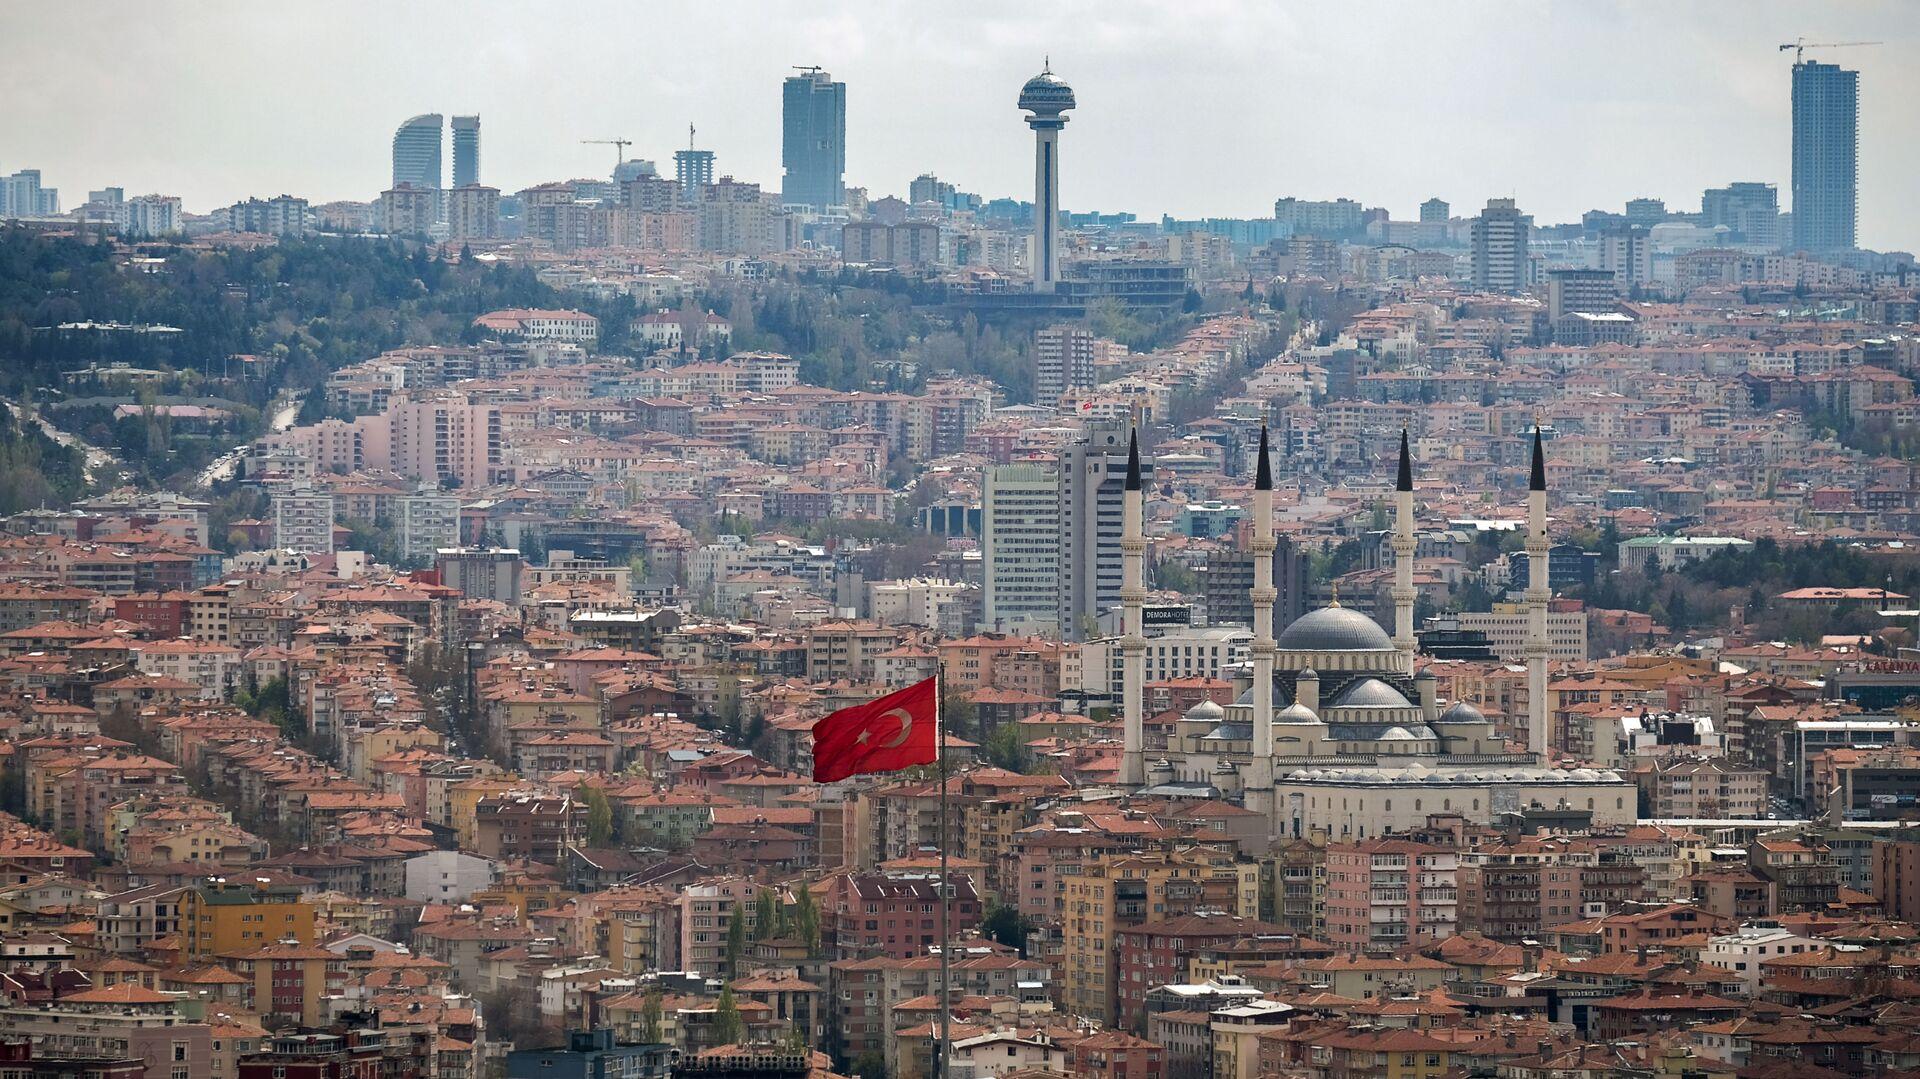 Ankara. Turcja - Sputnik Polska, 1920, 23.08.2021